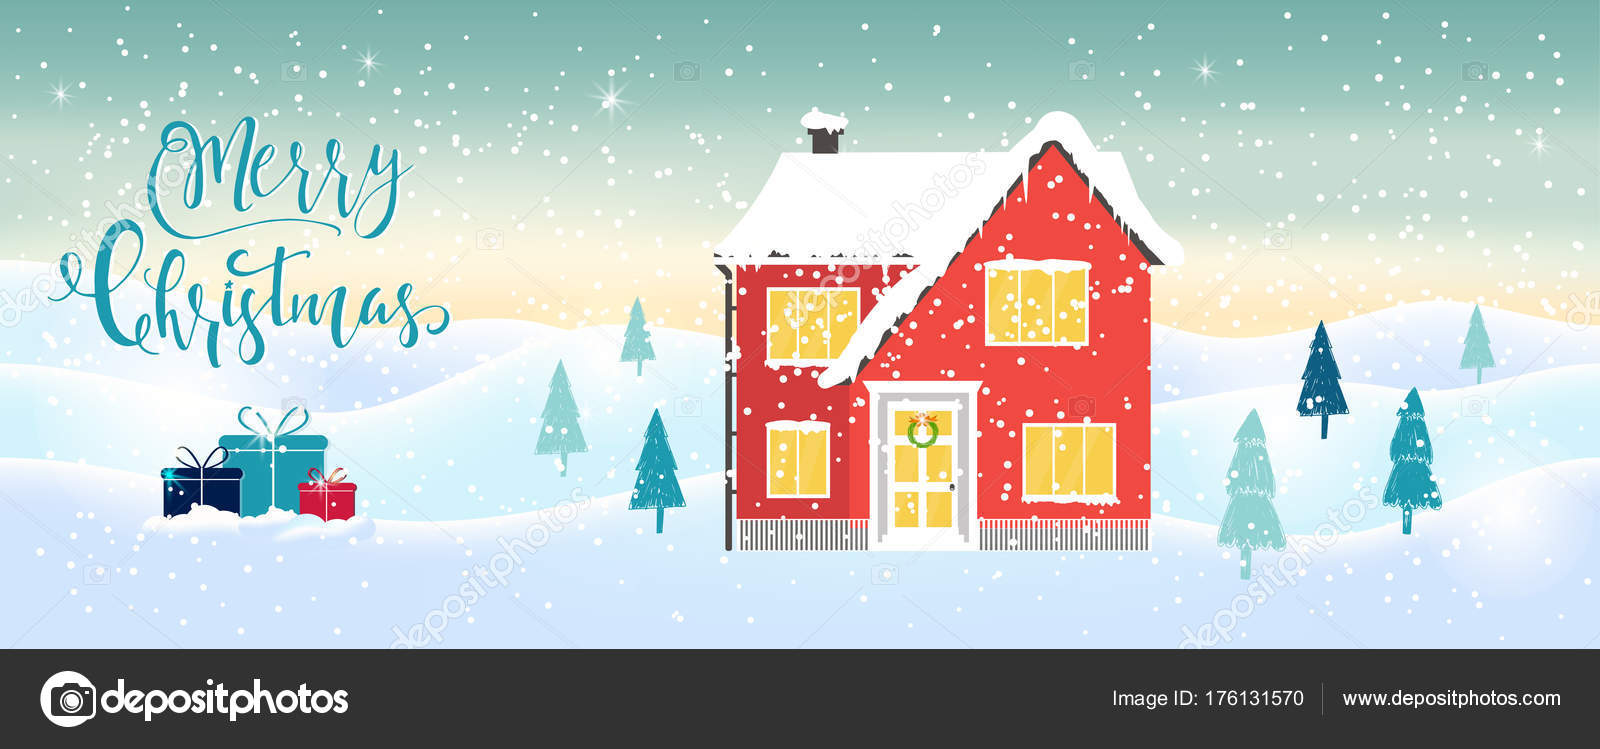 light blue christmas background winter house lettering white sparkling snowflakes stock vector c tanyasun 176131570 https depositphotos com 176131570 stock illustration light blue christmas background winter html